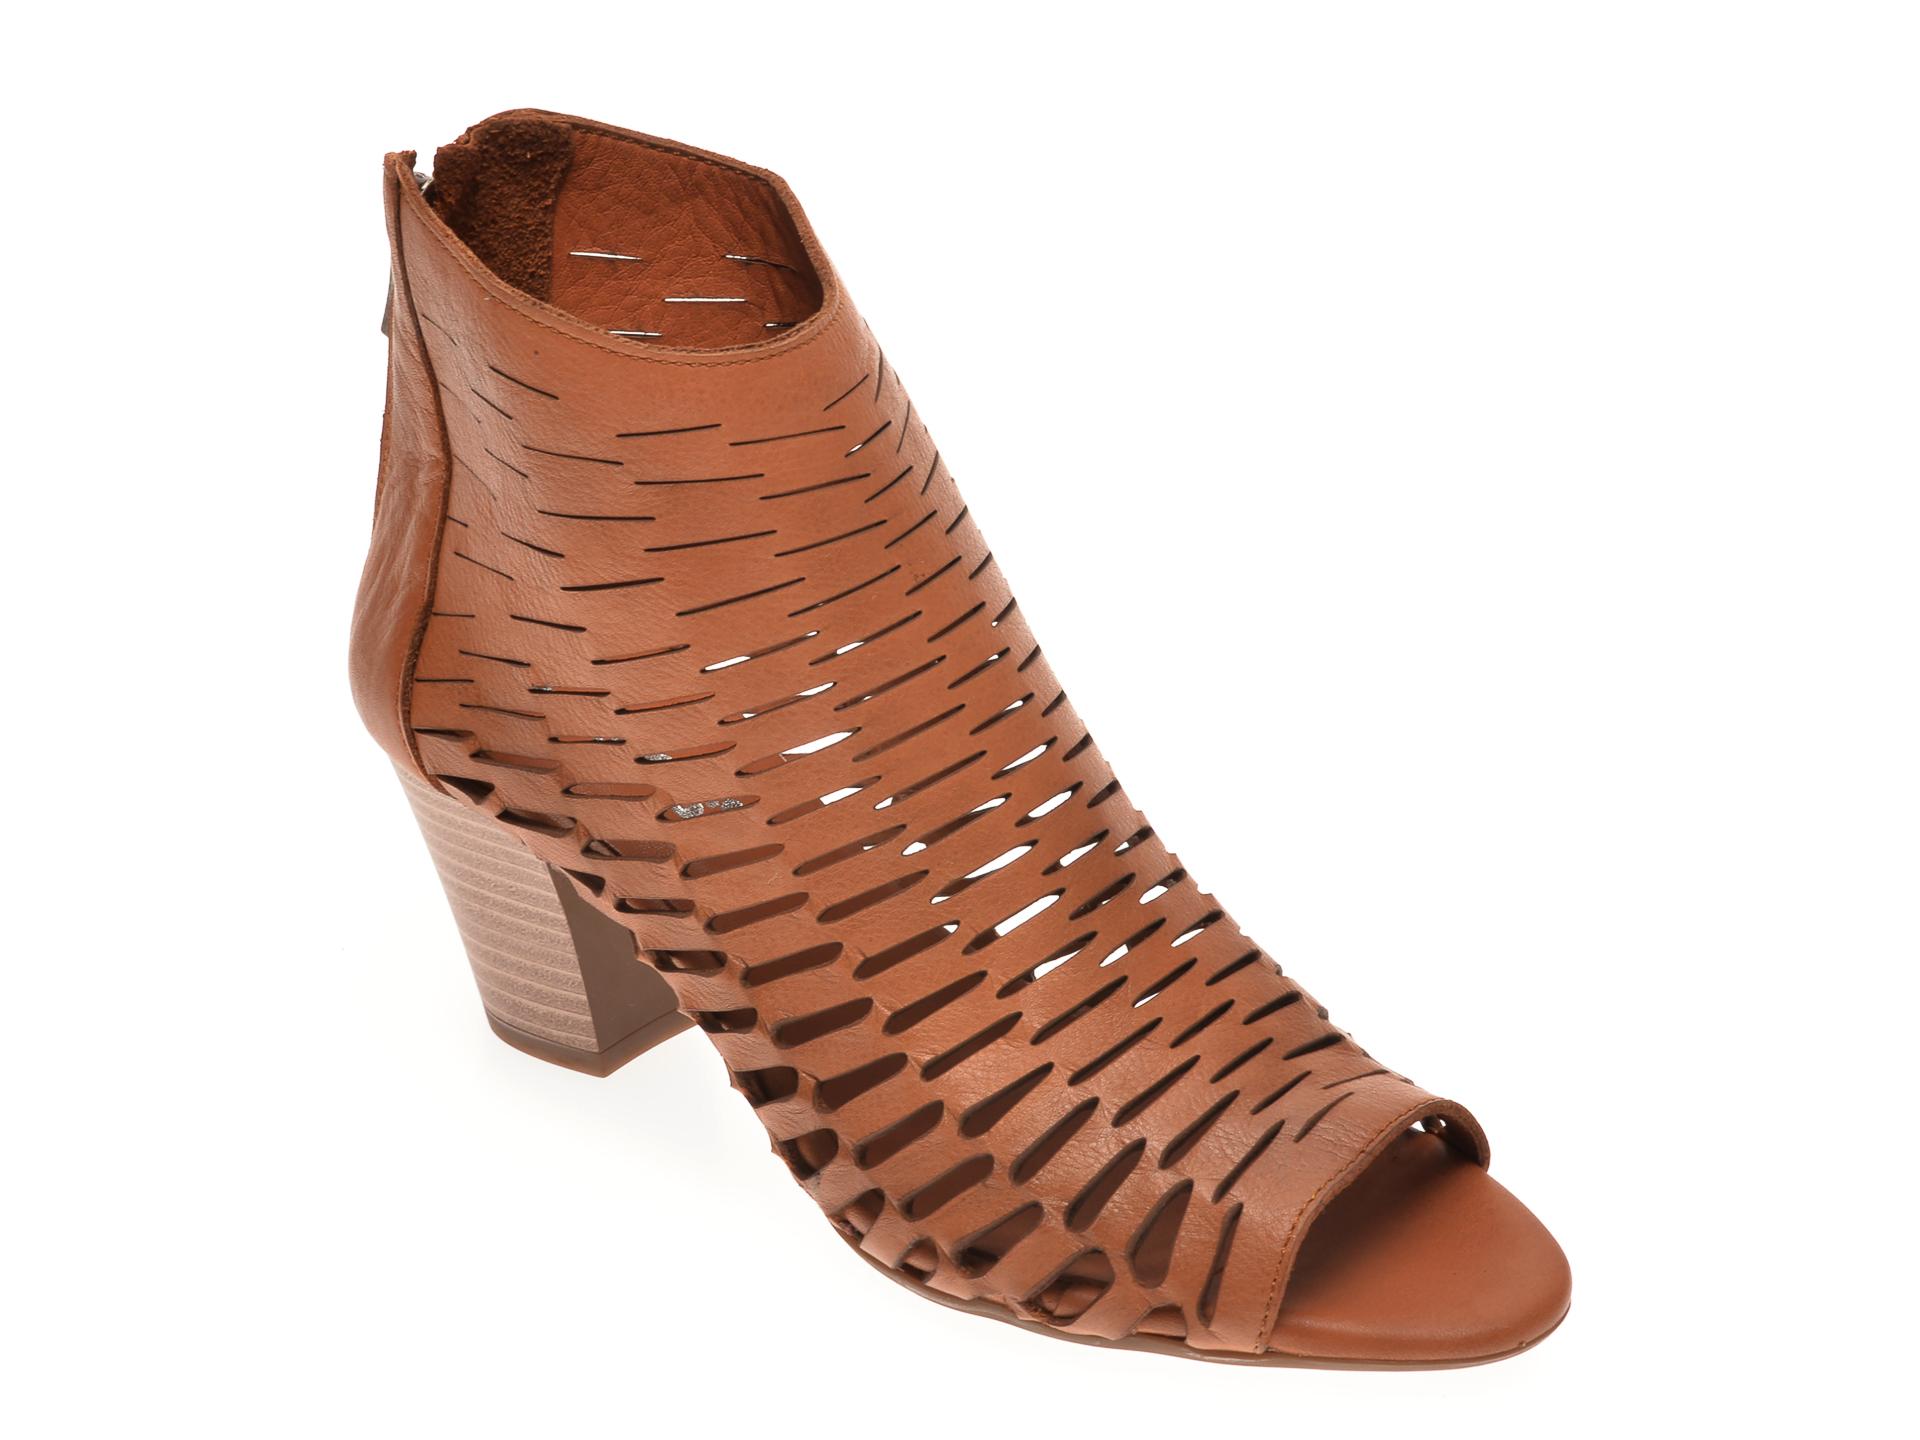 Sandale BABOOS maro, 339, din piele naturala